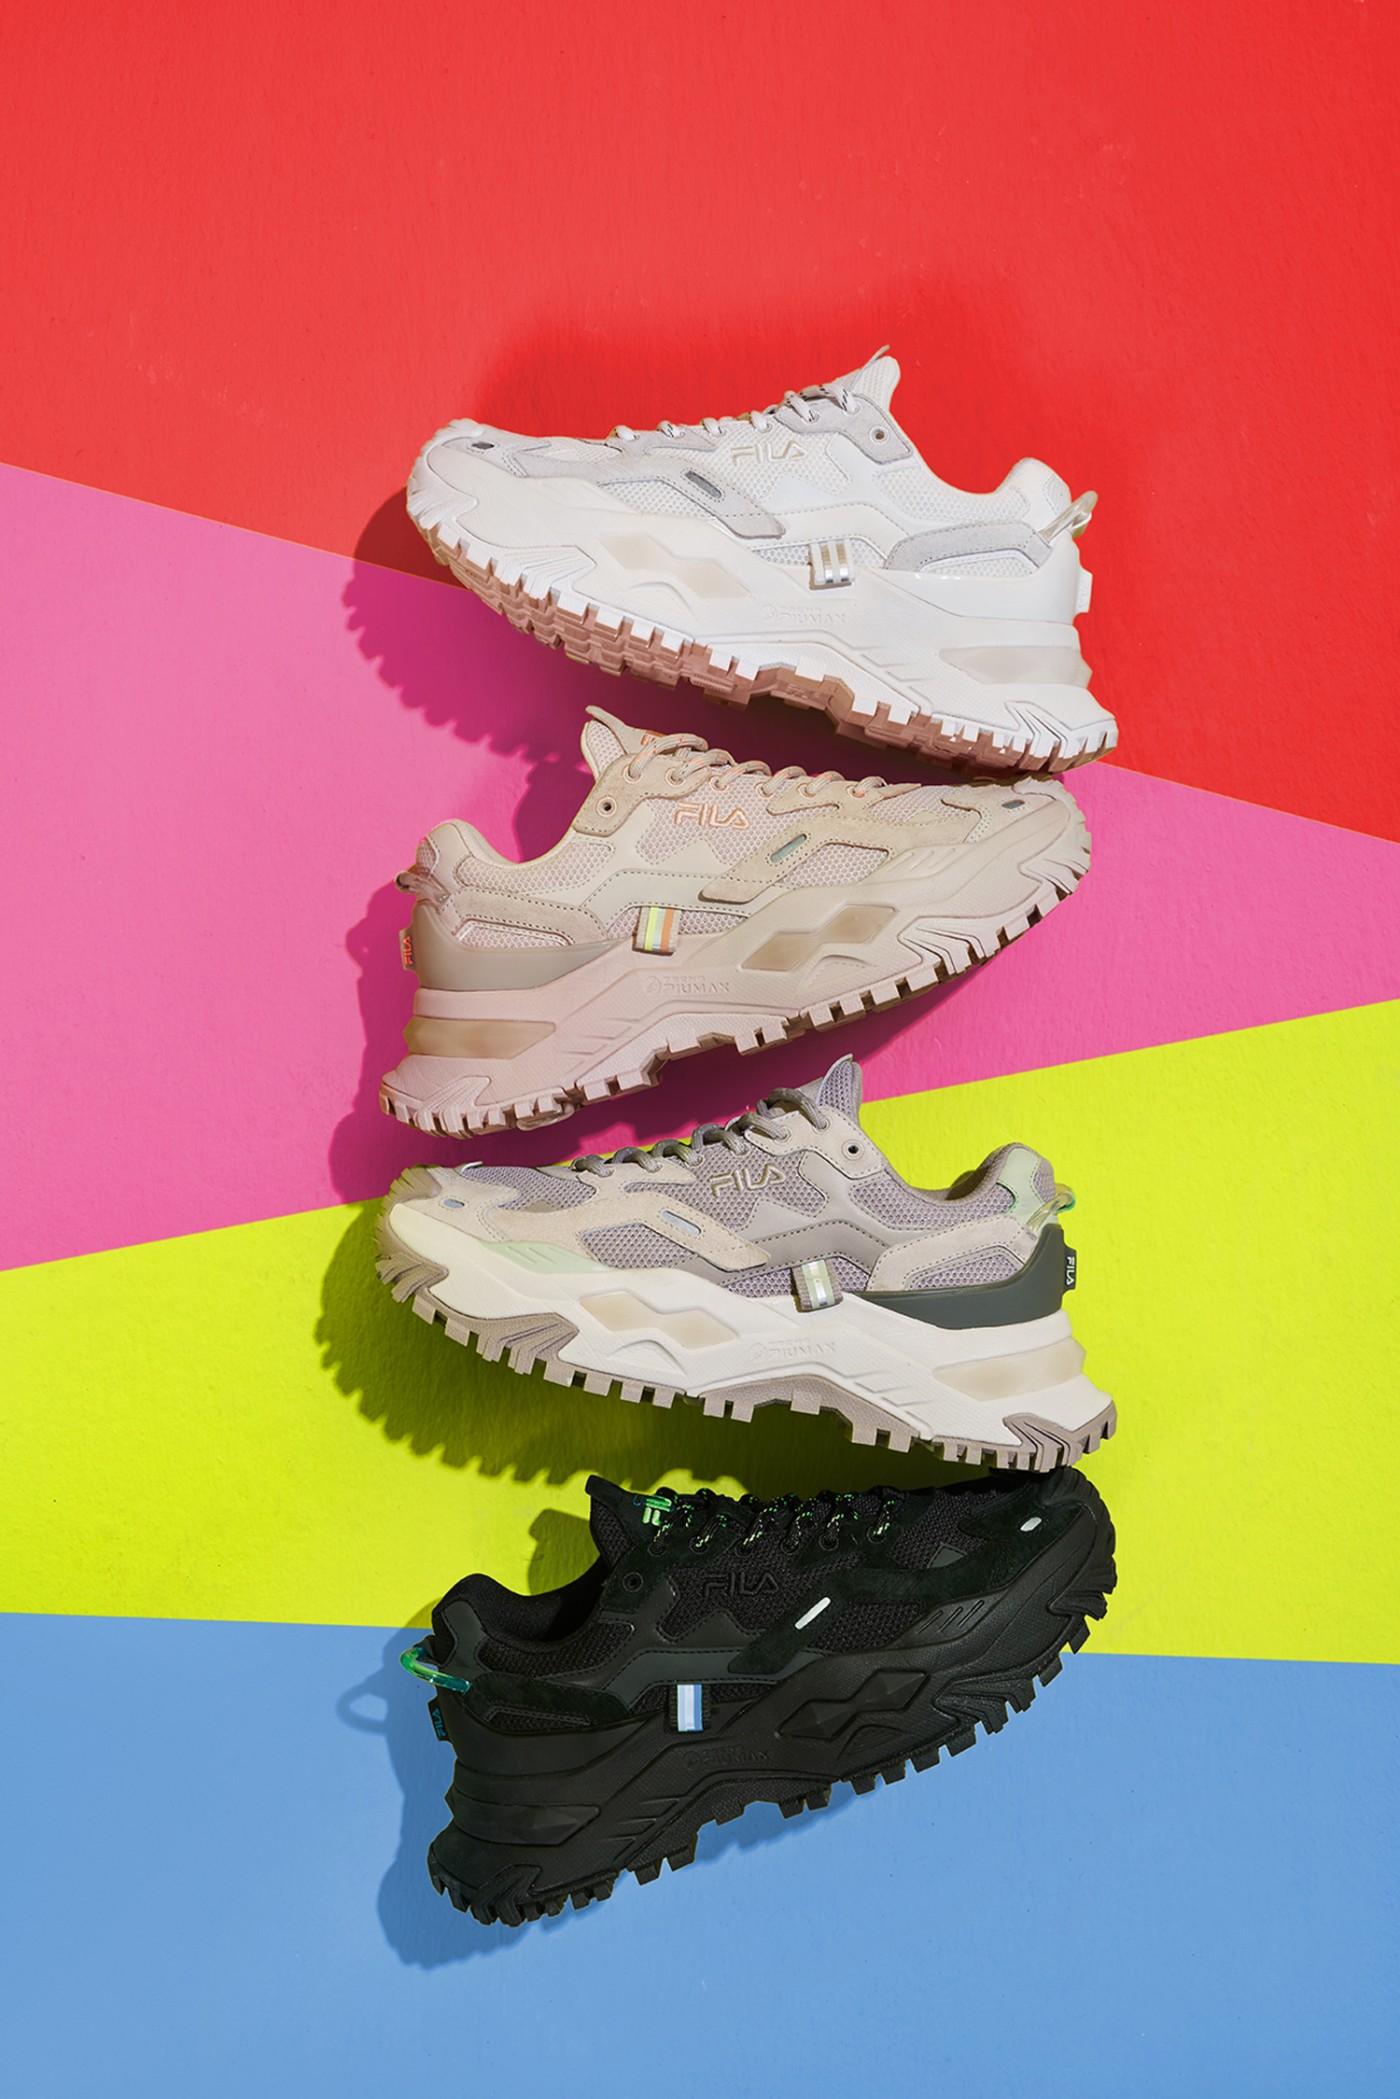 FILA FUSION,发售,BIANCO  增高 4.5 公分!这双鞋就是全新「长腿神器」!刚刚发售!